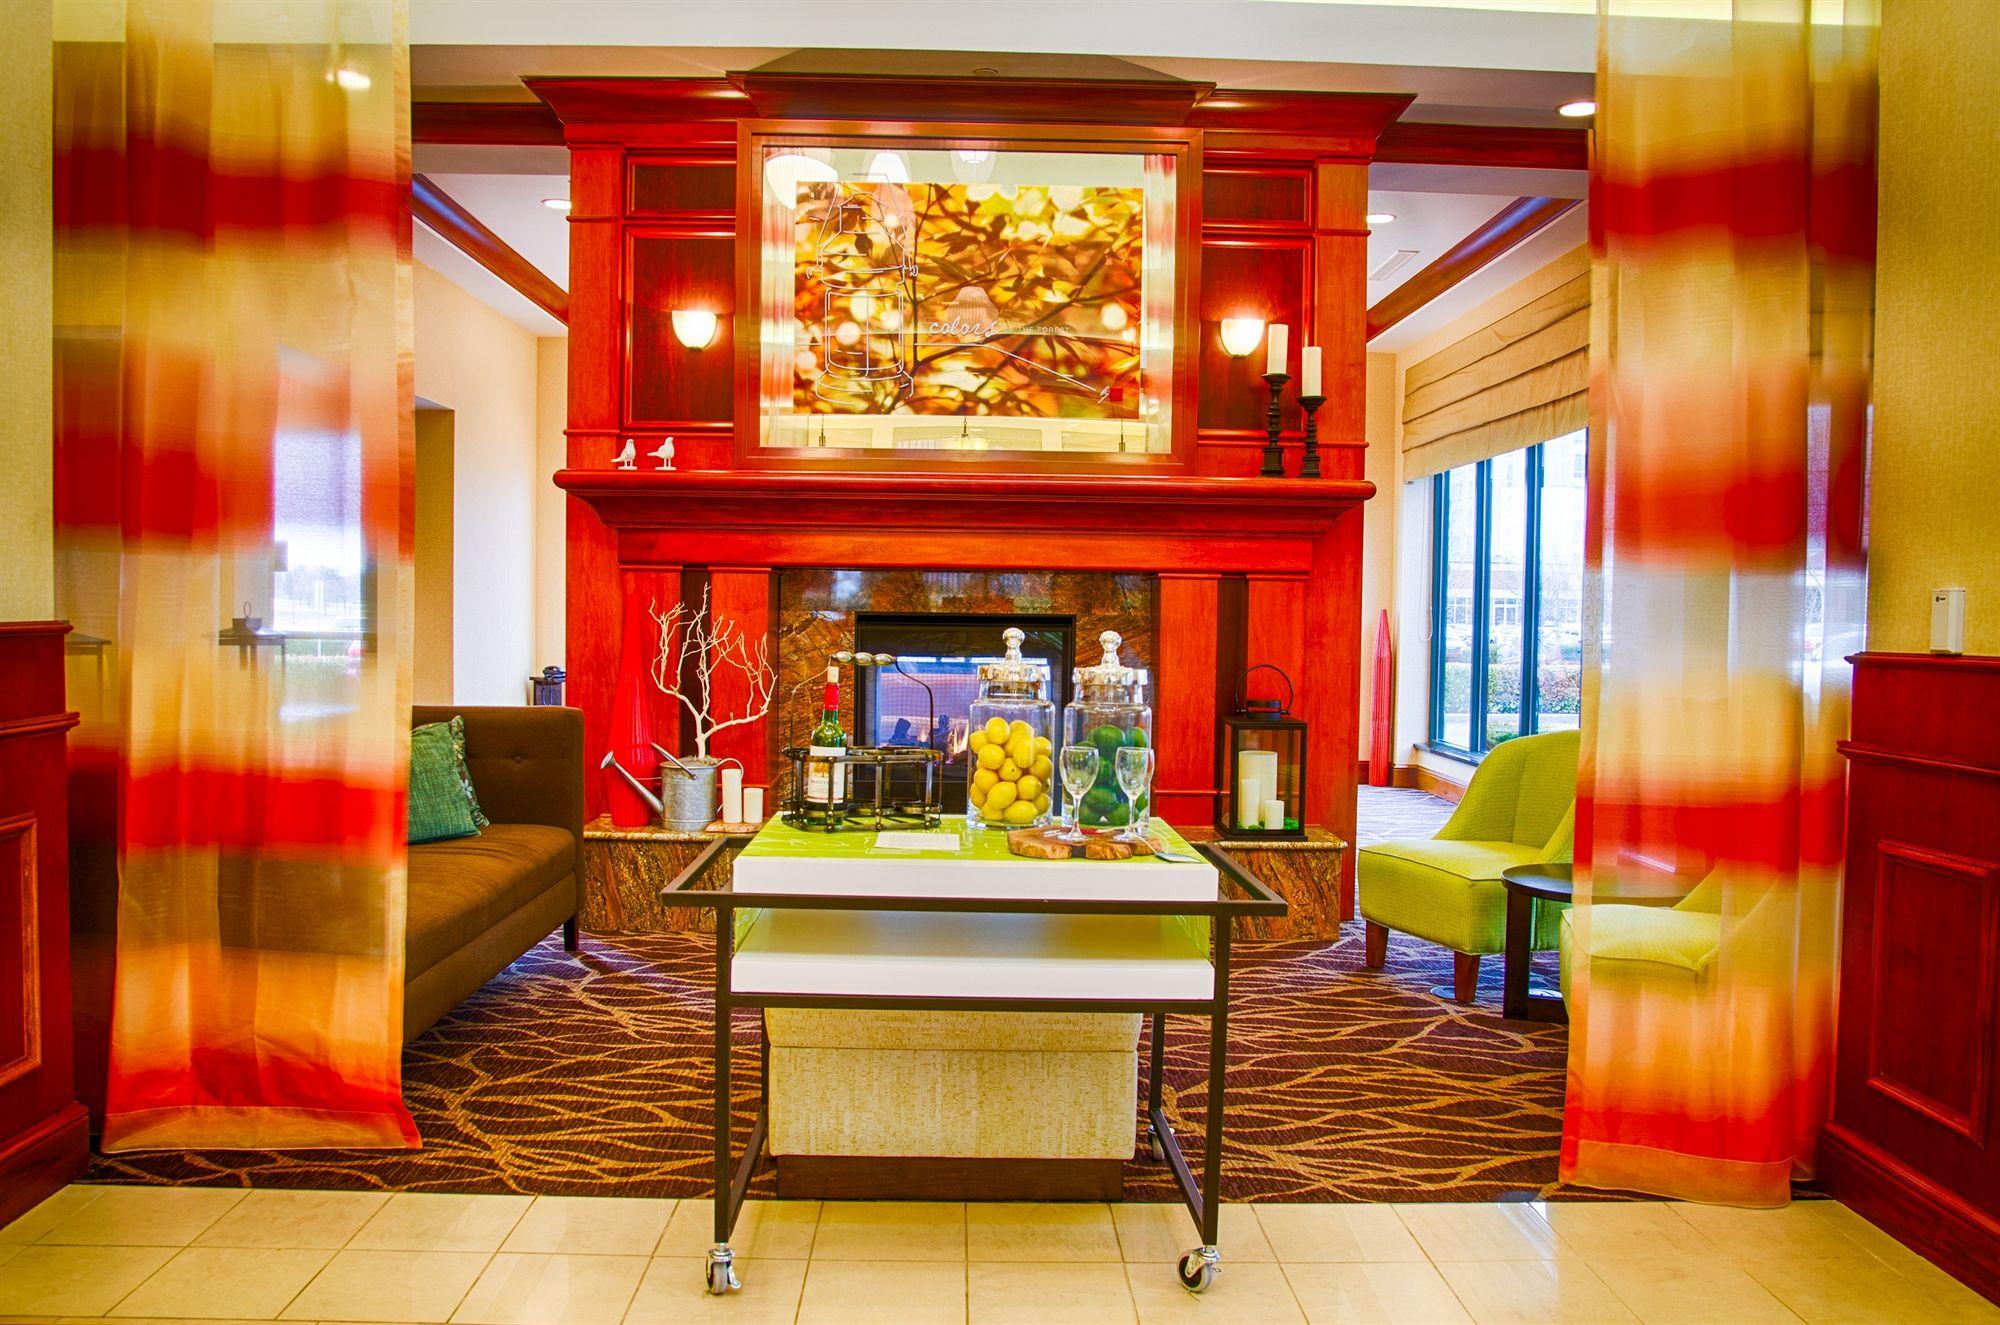 ... KY Hilton Garden Inn Bowling Green In Bowling Green, KY ...